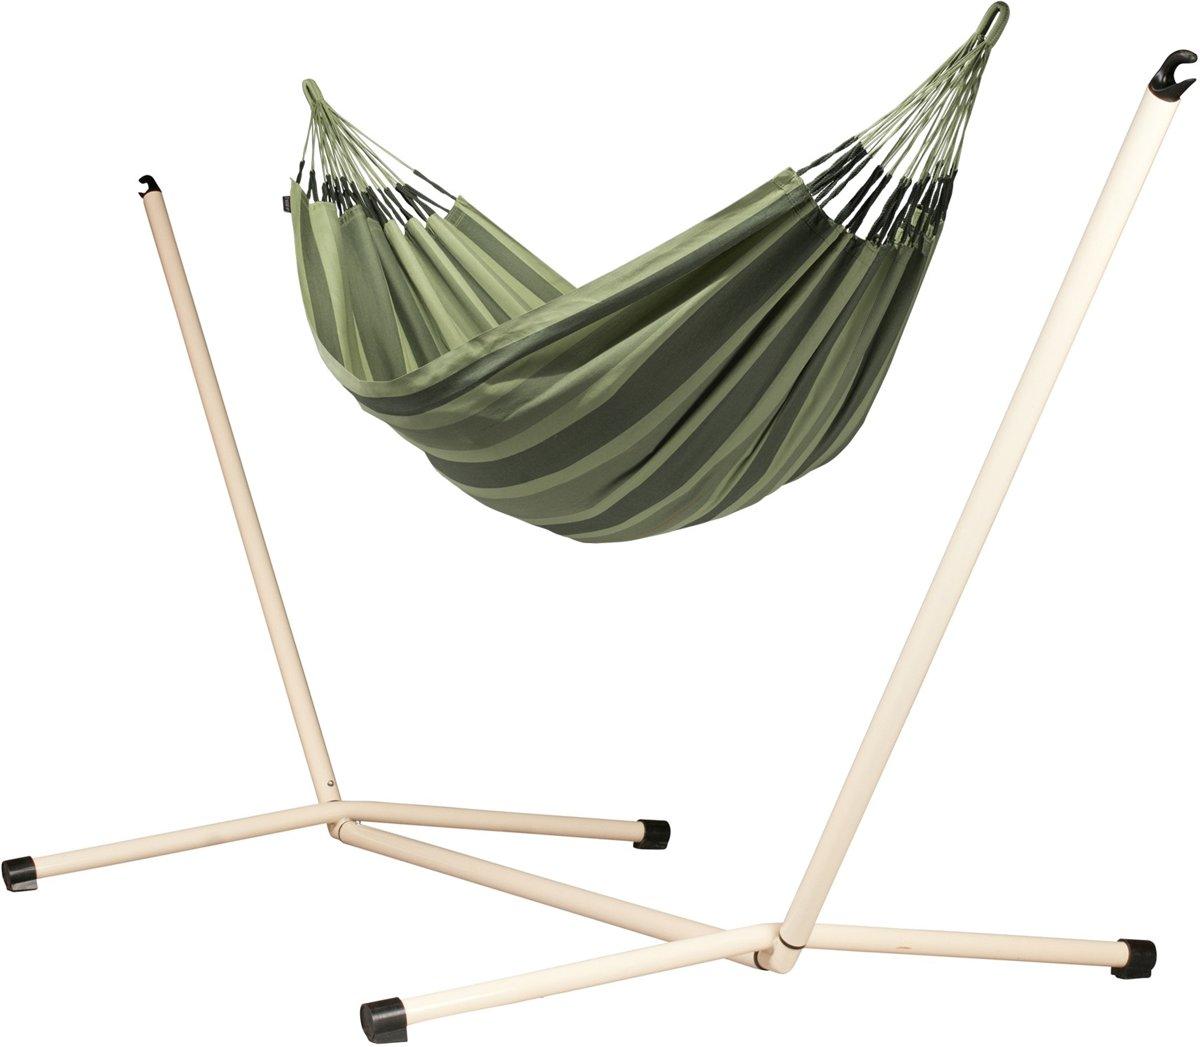 Hangmatset: 2-persoons hangmat AVENTURA forest + 2-persoons hangmat Standaard NEPTUNO